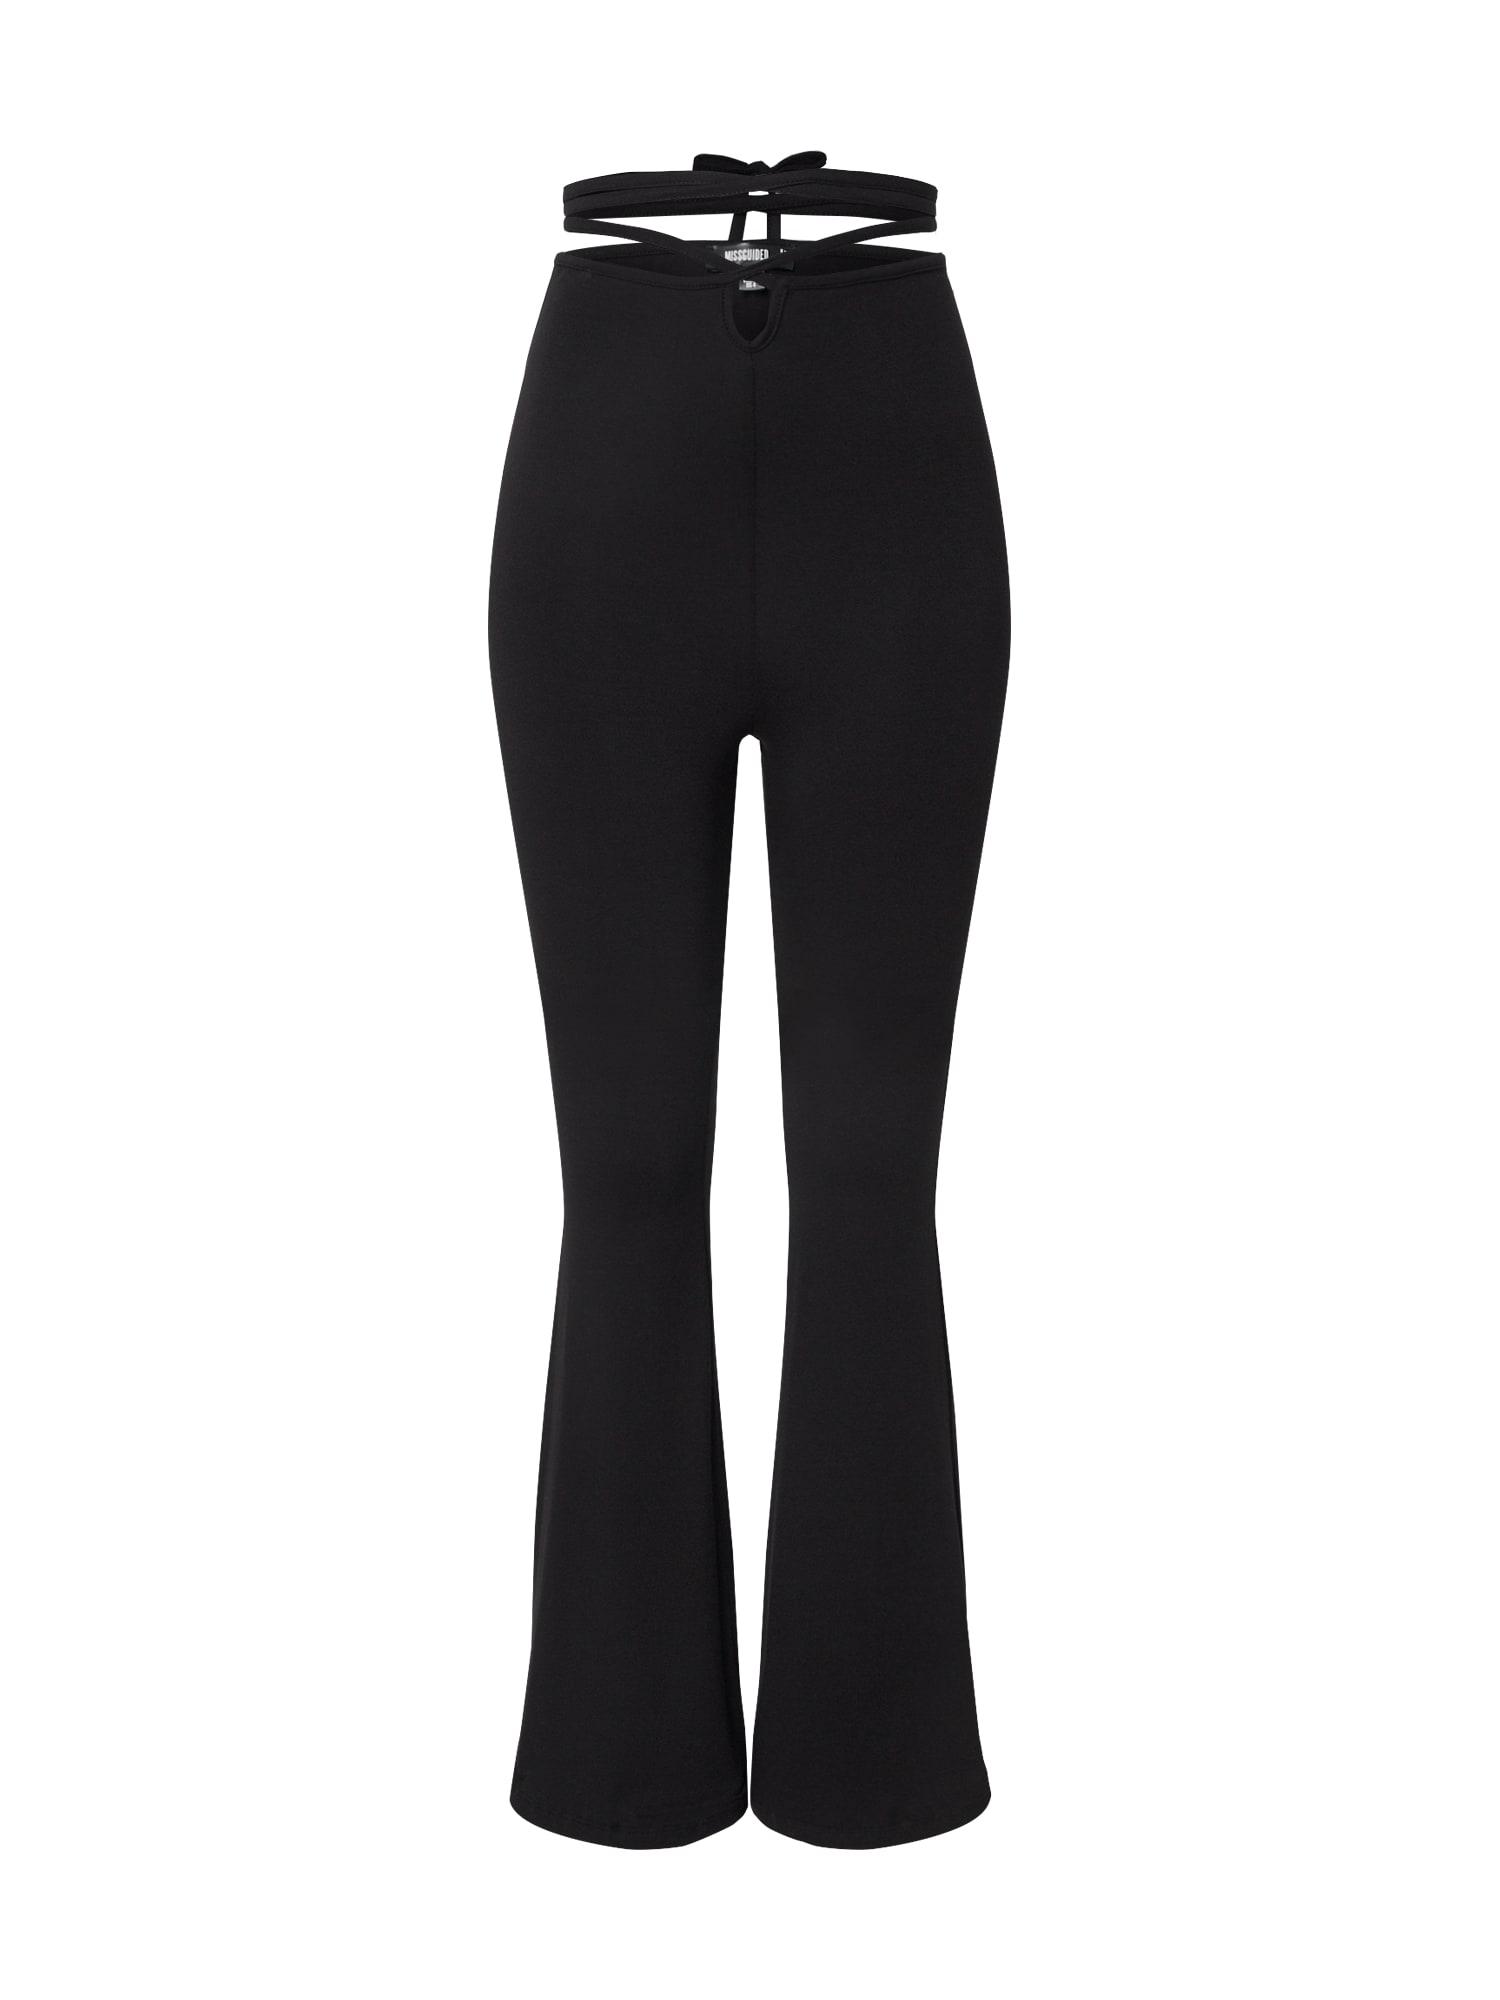 Missguided Leggings 'Tie Detail Flared Trousers'  negru